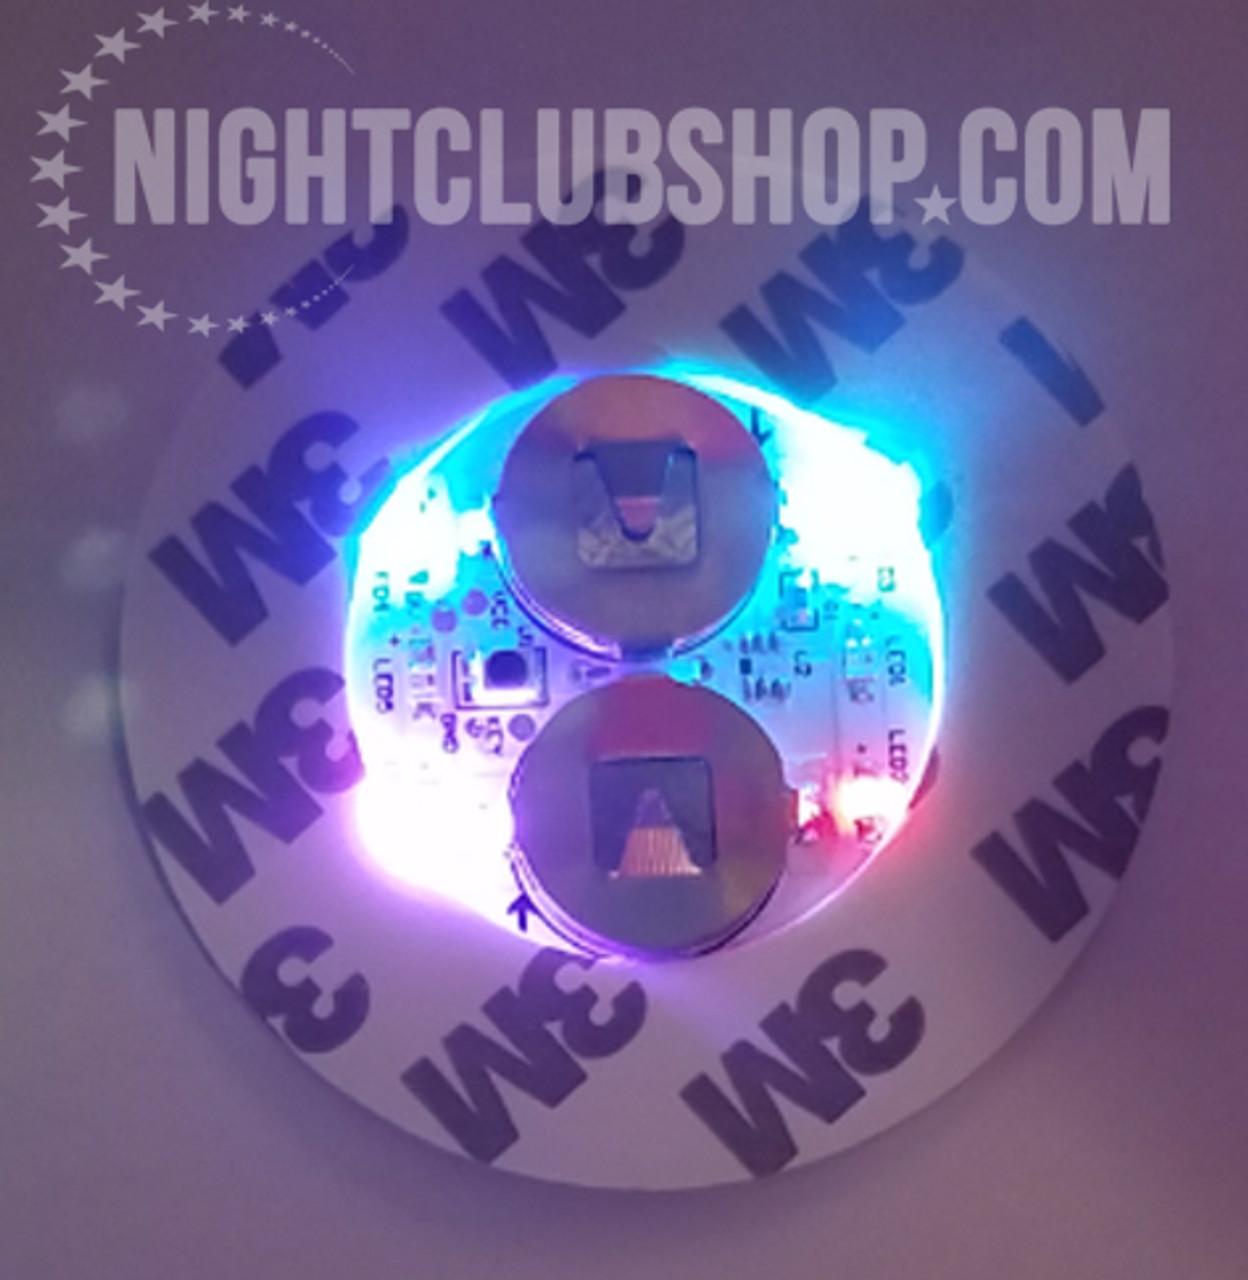 LED Bottle Glow, LED, Bottle, Bright, Light, illuminate, Glorifier, make bottle, light up, glowing, liquor, Belvedere, RGB, RGB LED, Multi-color, multi-color LED, Multi color, LED's,